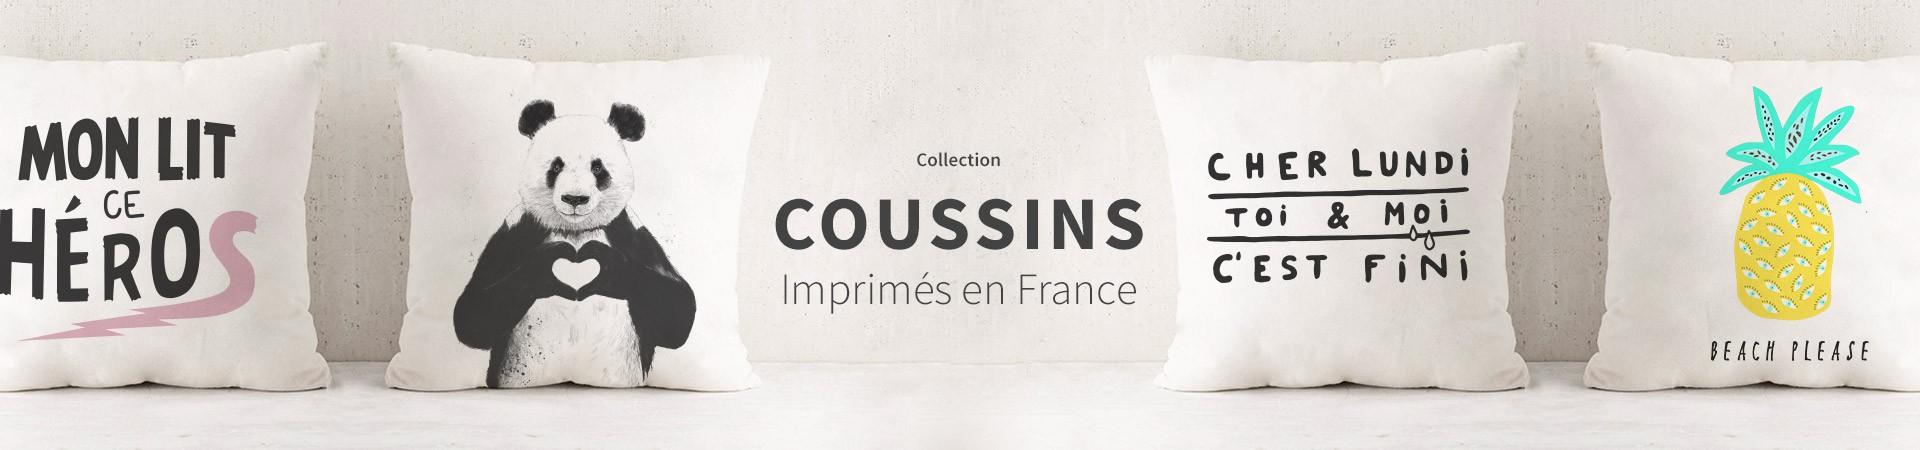 Coussins